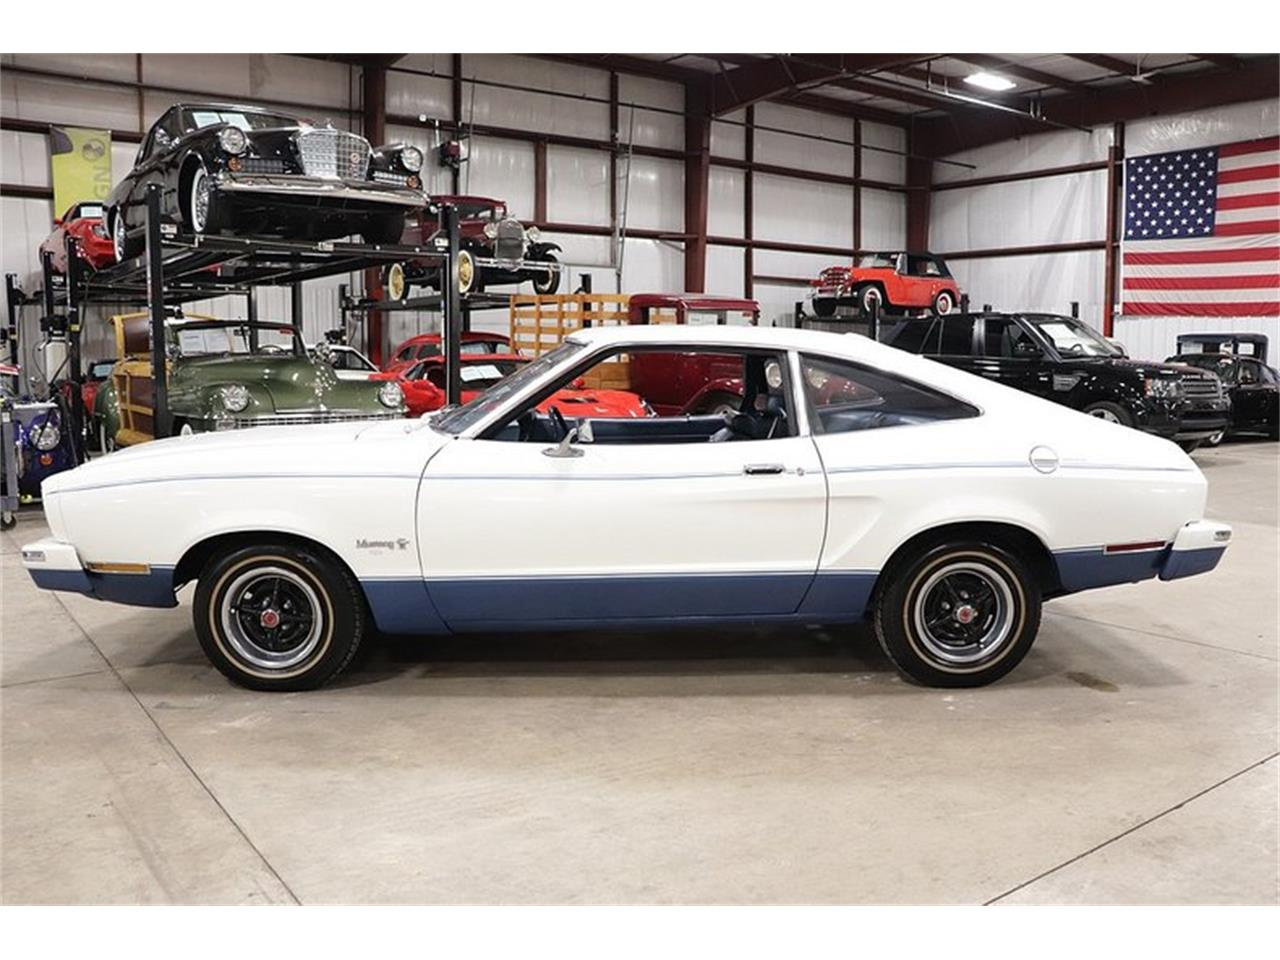 1976 Ford Mustang Ii Cobra For Sale Classiccarscom Cc 1168228